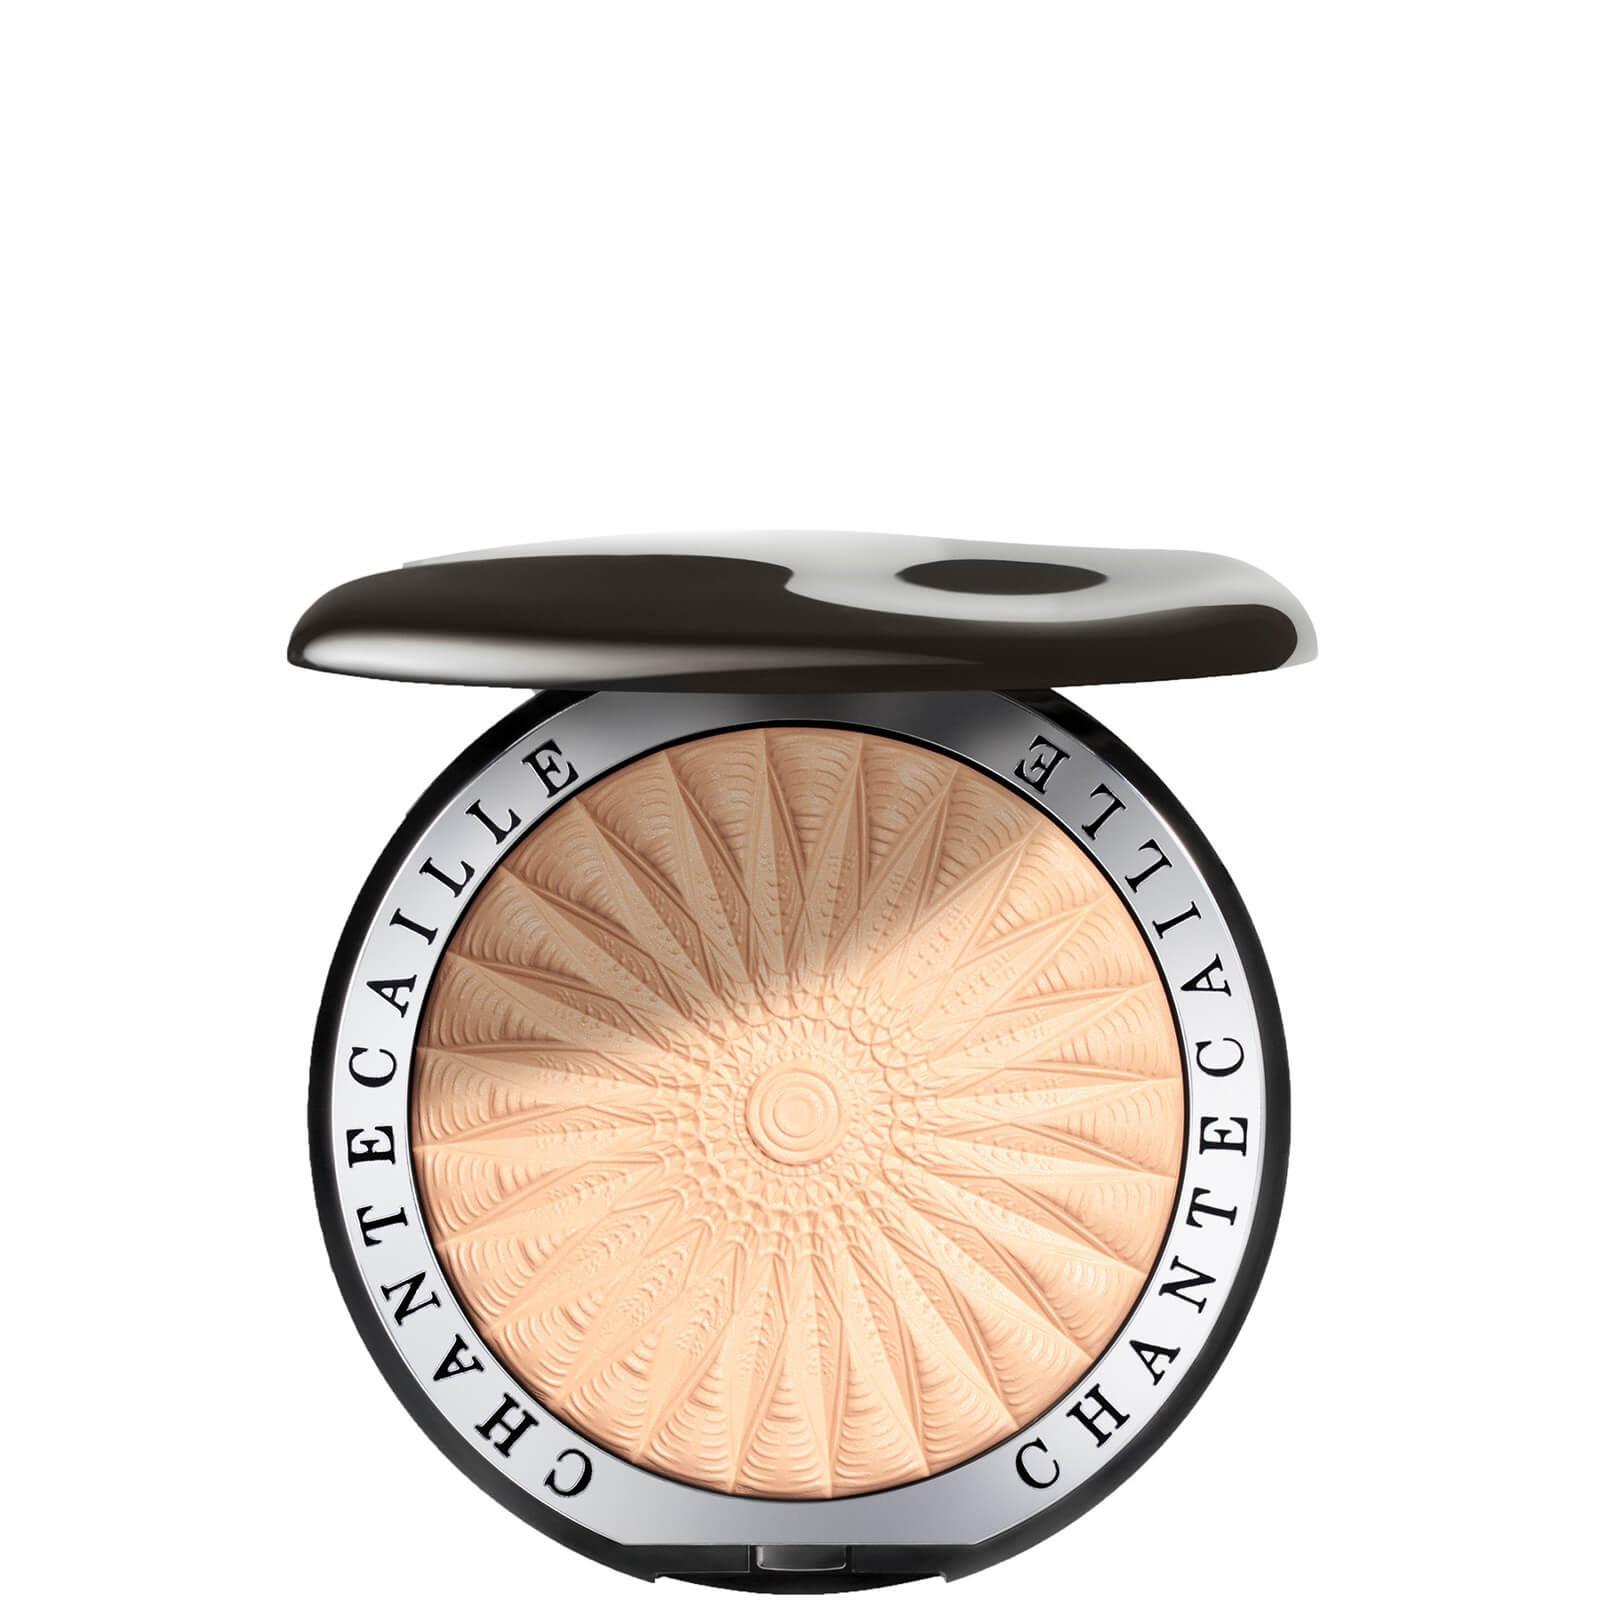 Купить Chantecaille Perfect Blur Finishing Powder - Light-Medium 8g